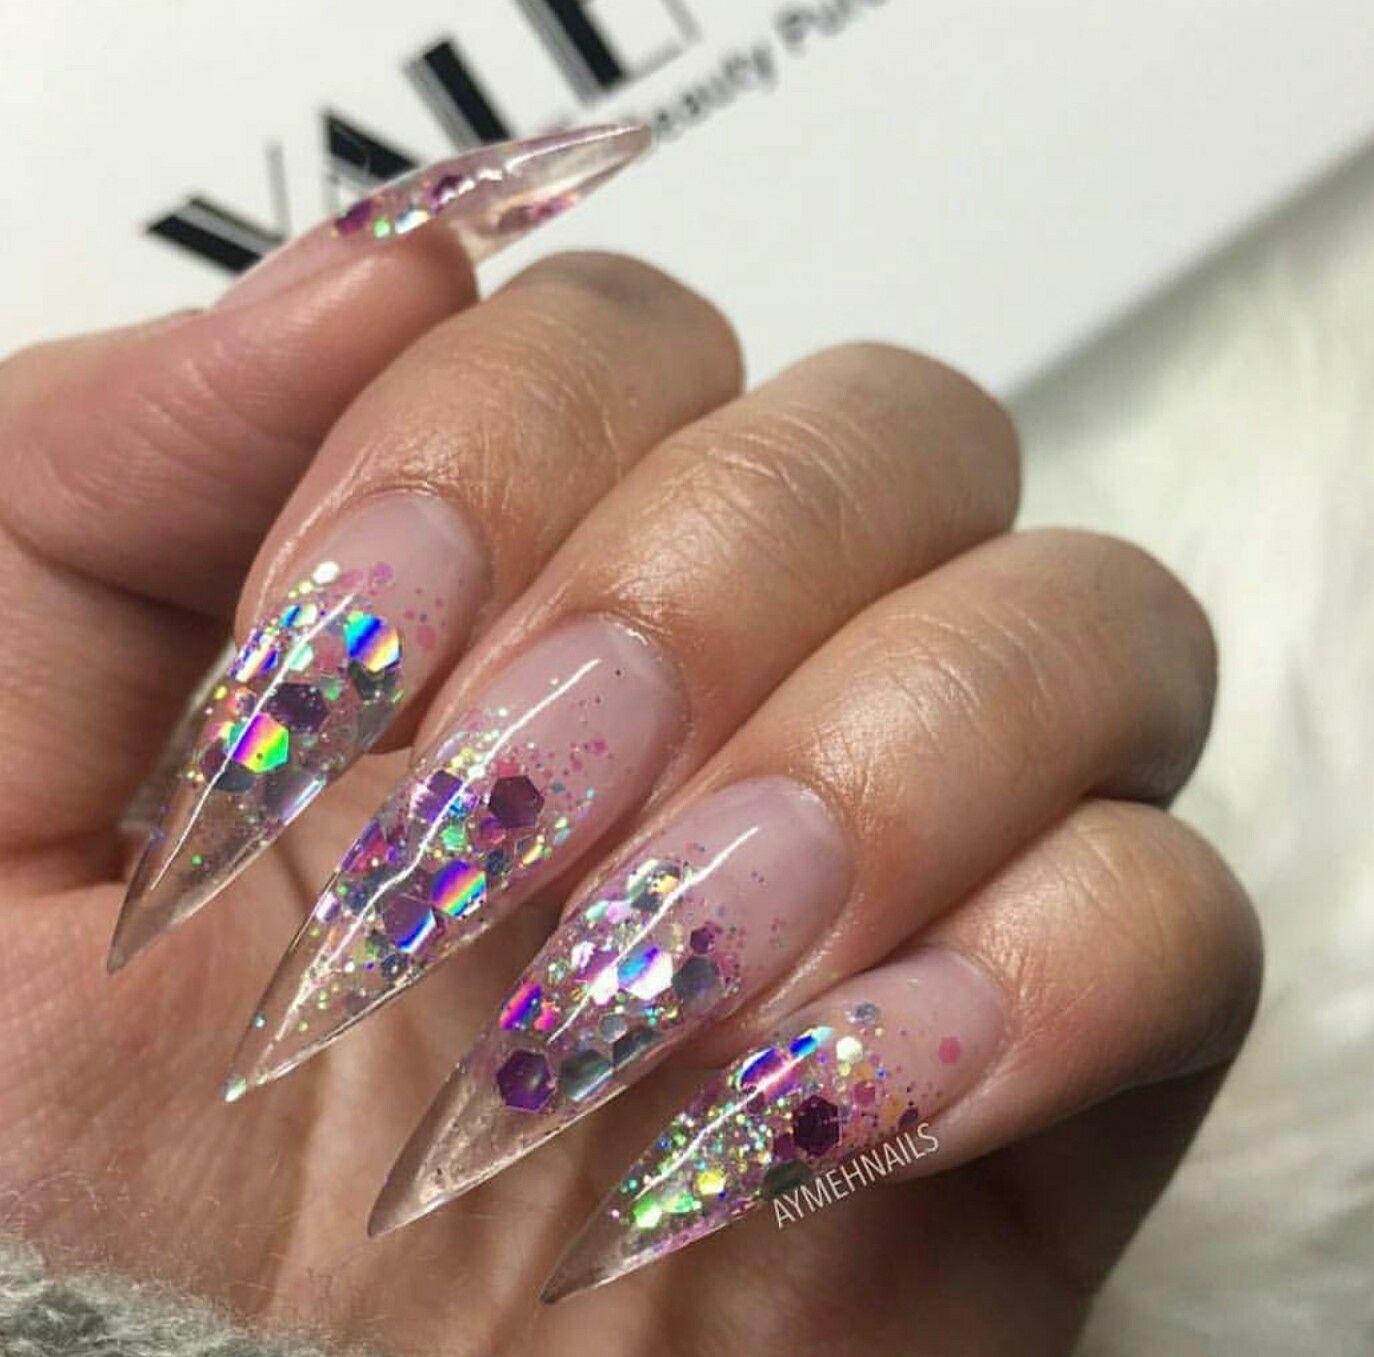 Nails clear nails stiletto nails acrylics nails nail styles in